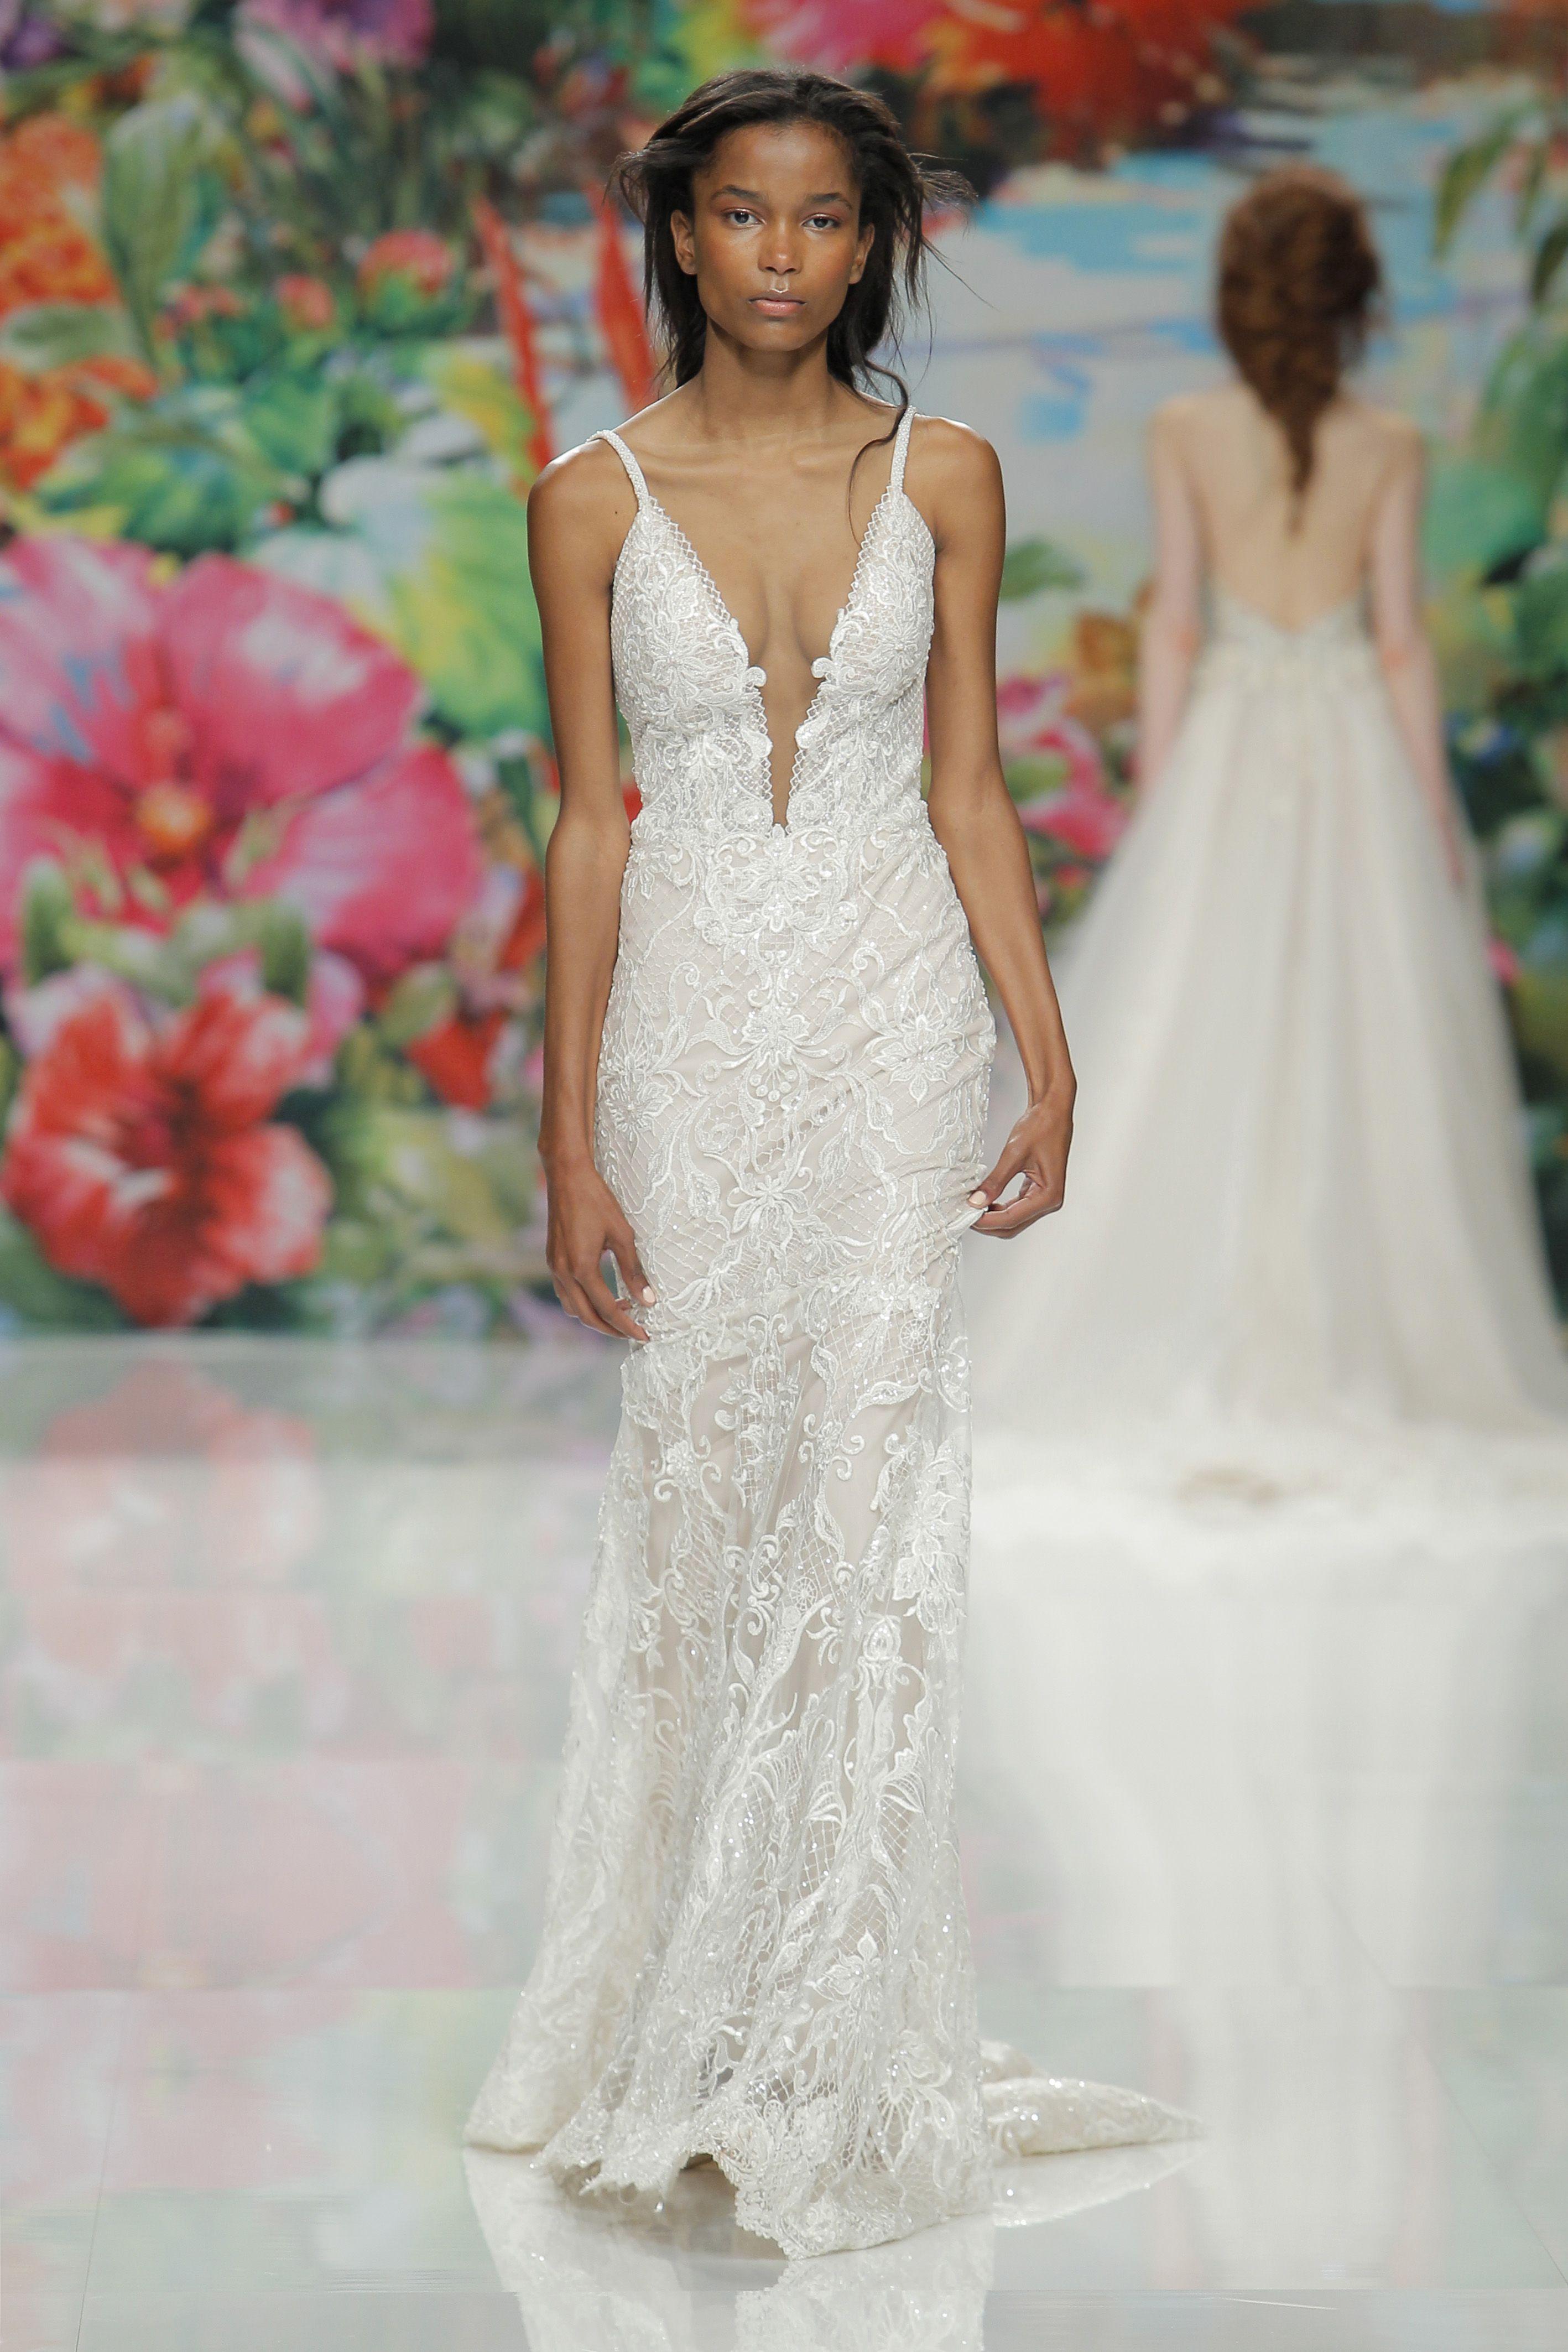 Barcelone Bridal Fashion Week Haute Couture Galia Lahav Dresses Visit Us At Www Gal Wedding Dresses For Tall Women Gahlia Lahav Wedding Dress Wedding Dresses